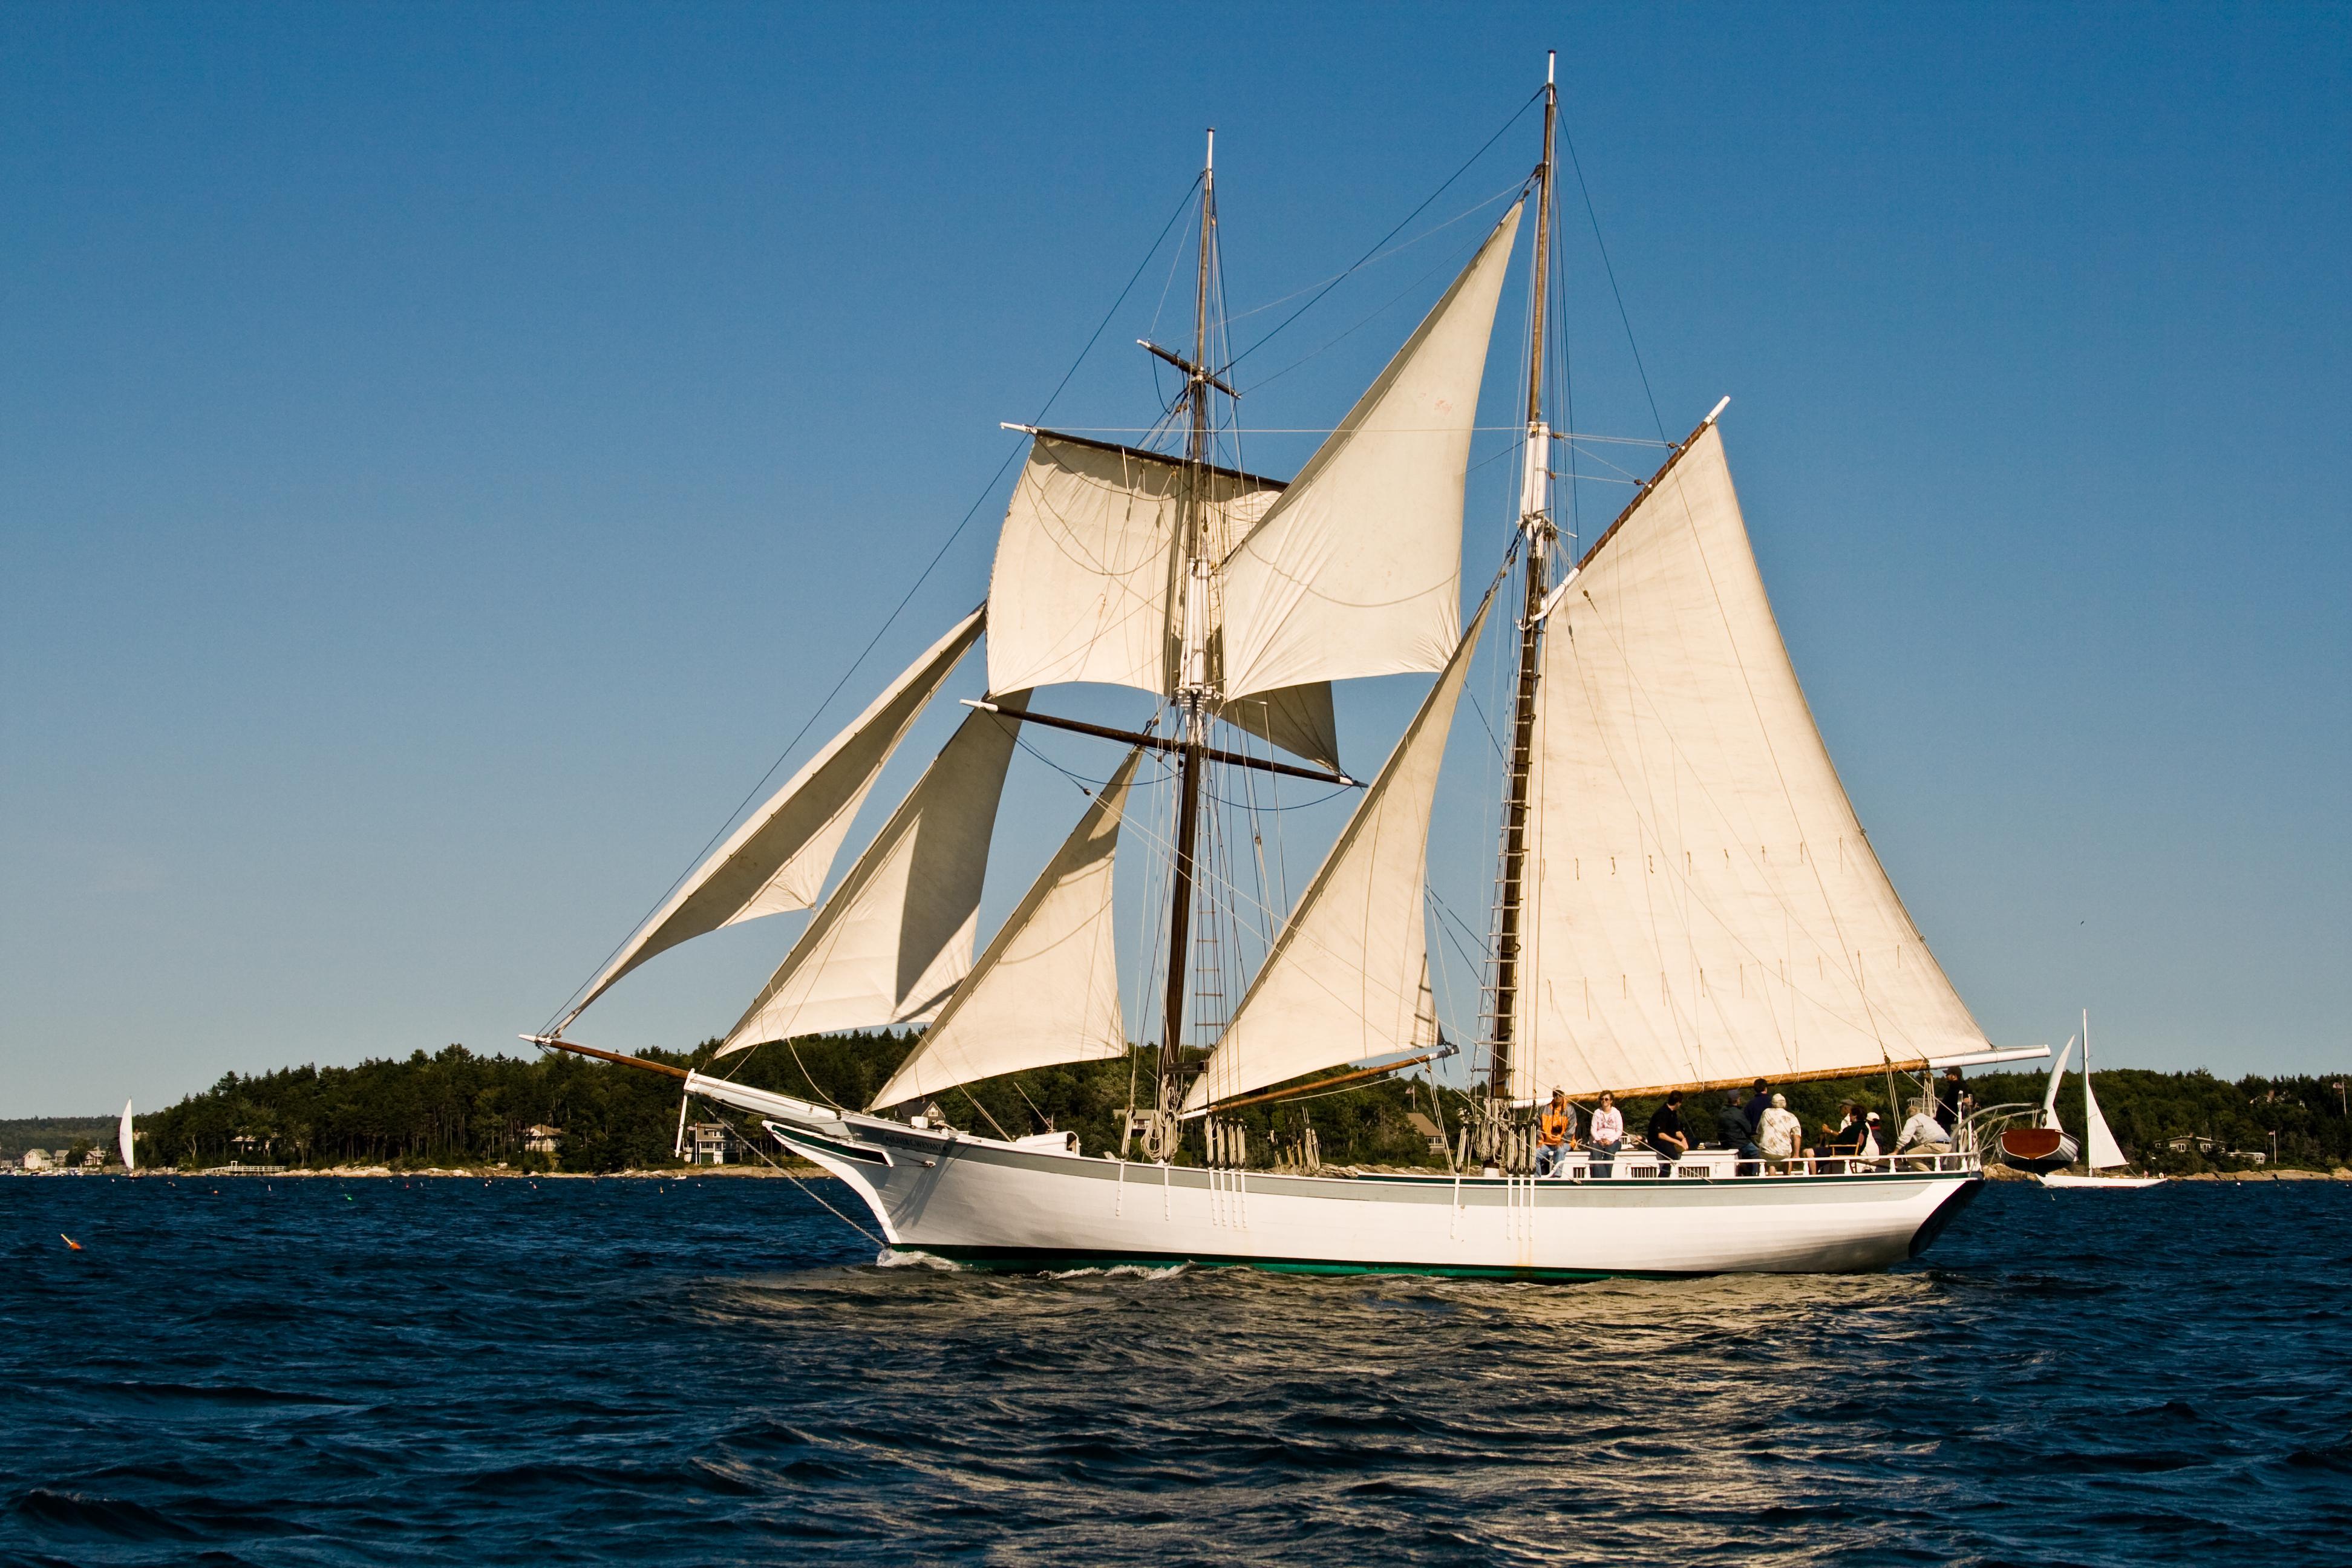 File:White Sailing Boat.jpg - Wikimedia Commons